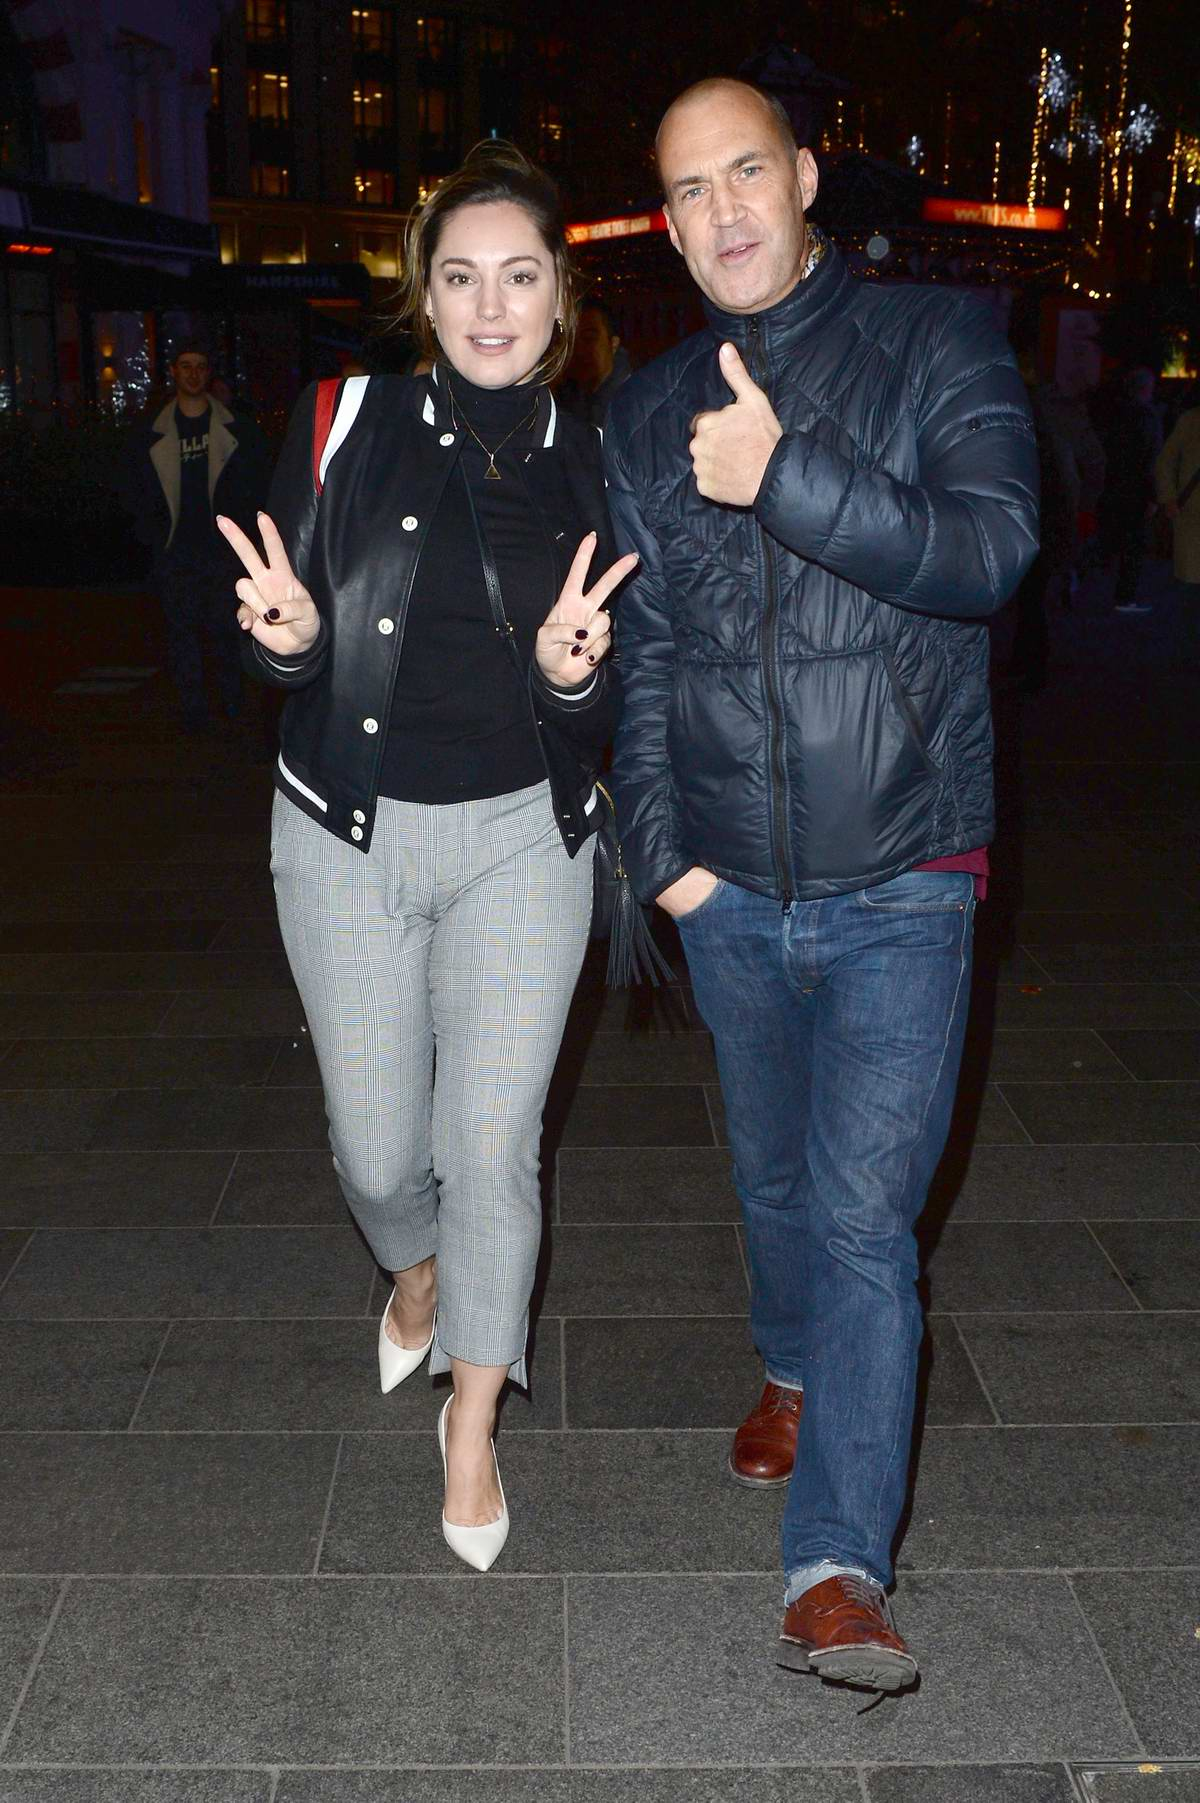 Kelly Brook seen leaving the Global Radio Studios on Trafalgar Square in London, UK